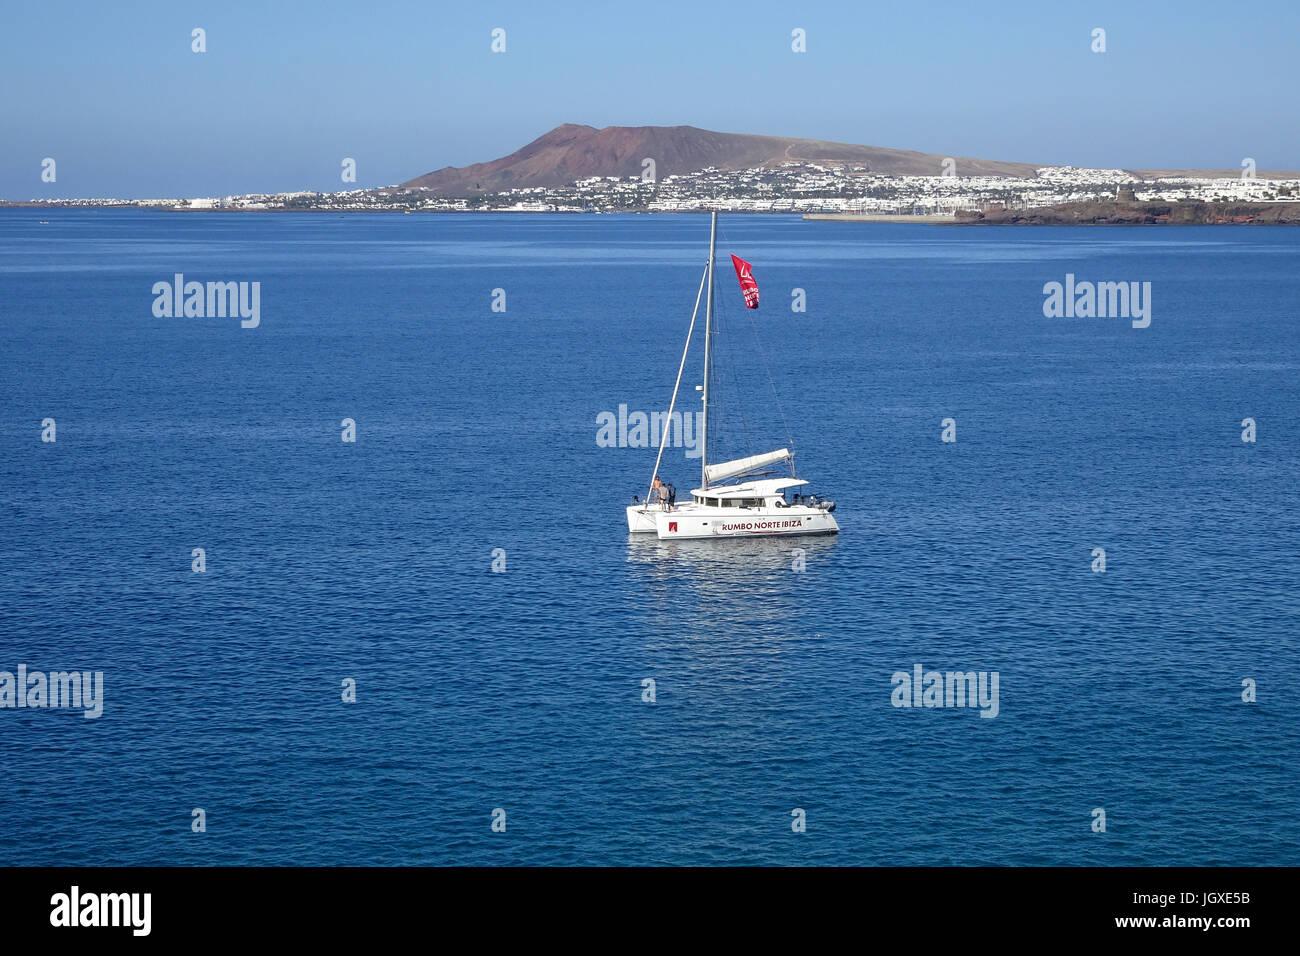 Katamaran vor Playa Blanca, Lanzarote, Kanarische Inseln, Europa | catamara am Playa Blanca, Lanzarote, Kanarische Stockbild